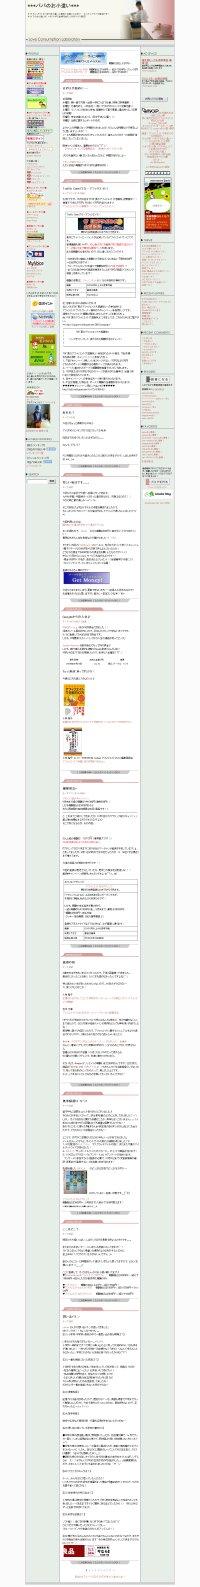 heso-kuri.jpg